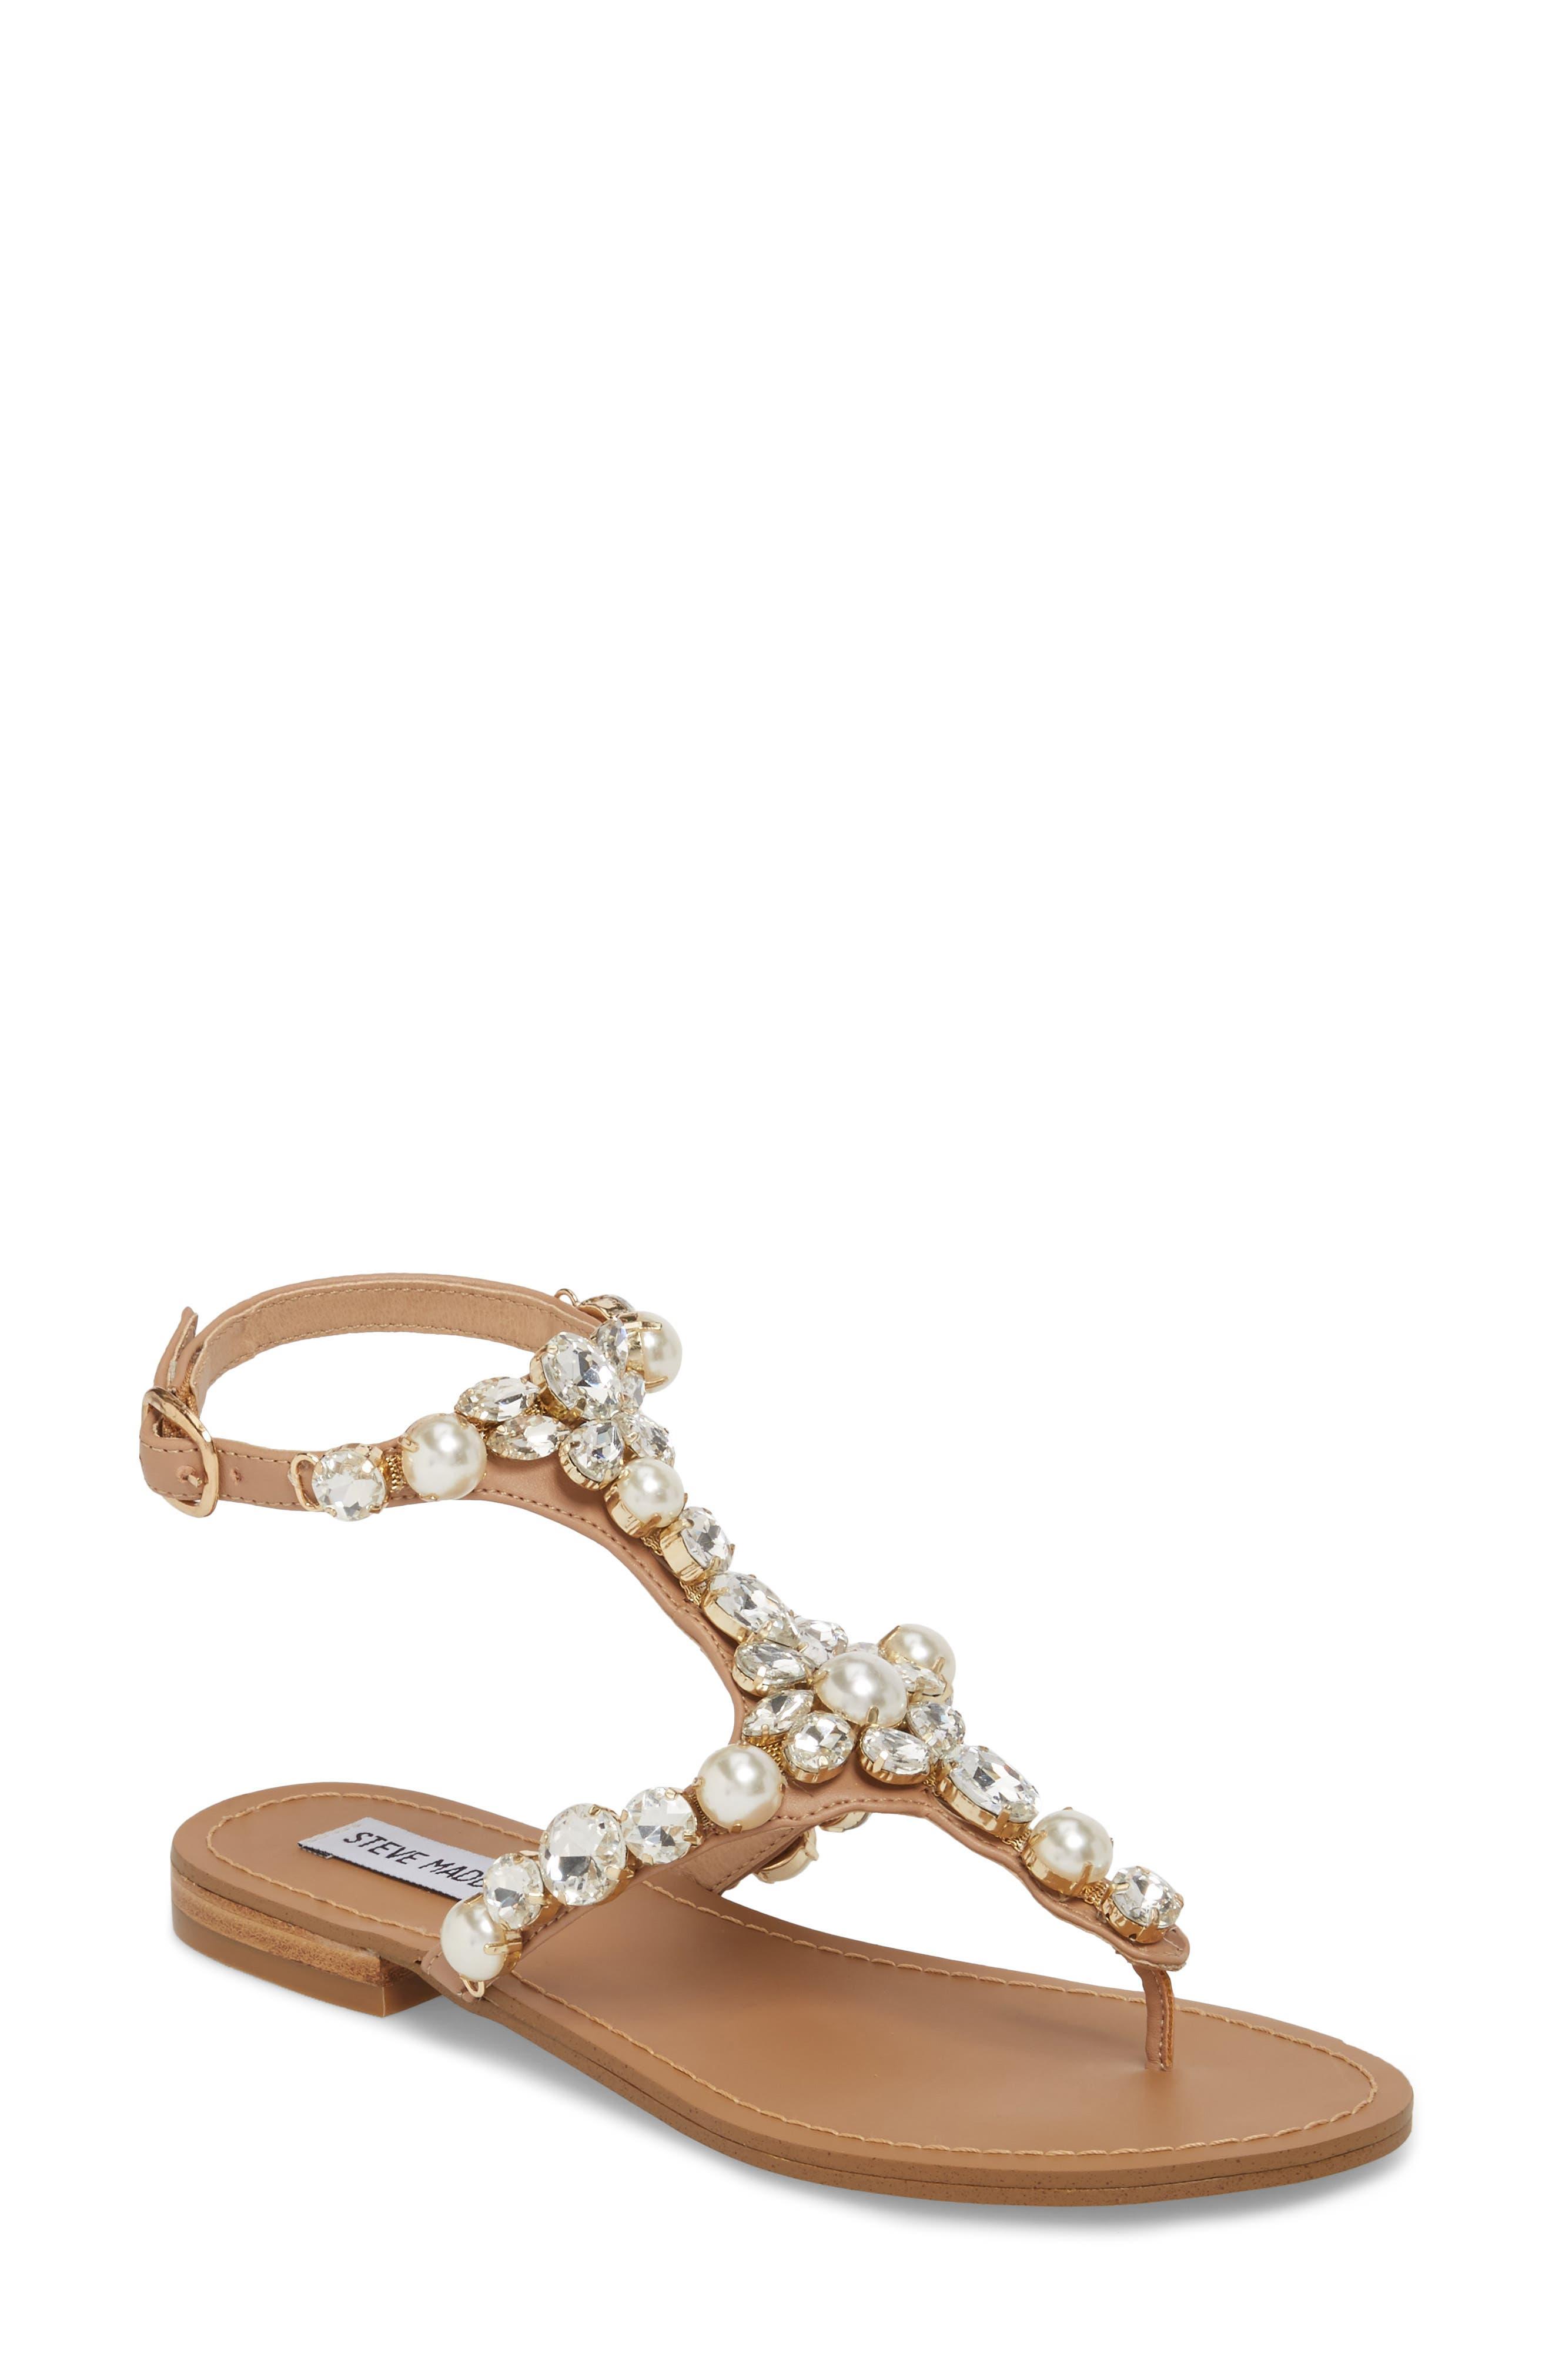 Chantel Crystal Embellished Sandal,                             Main thumbnail 2, color,